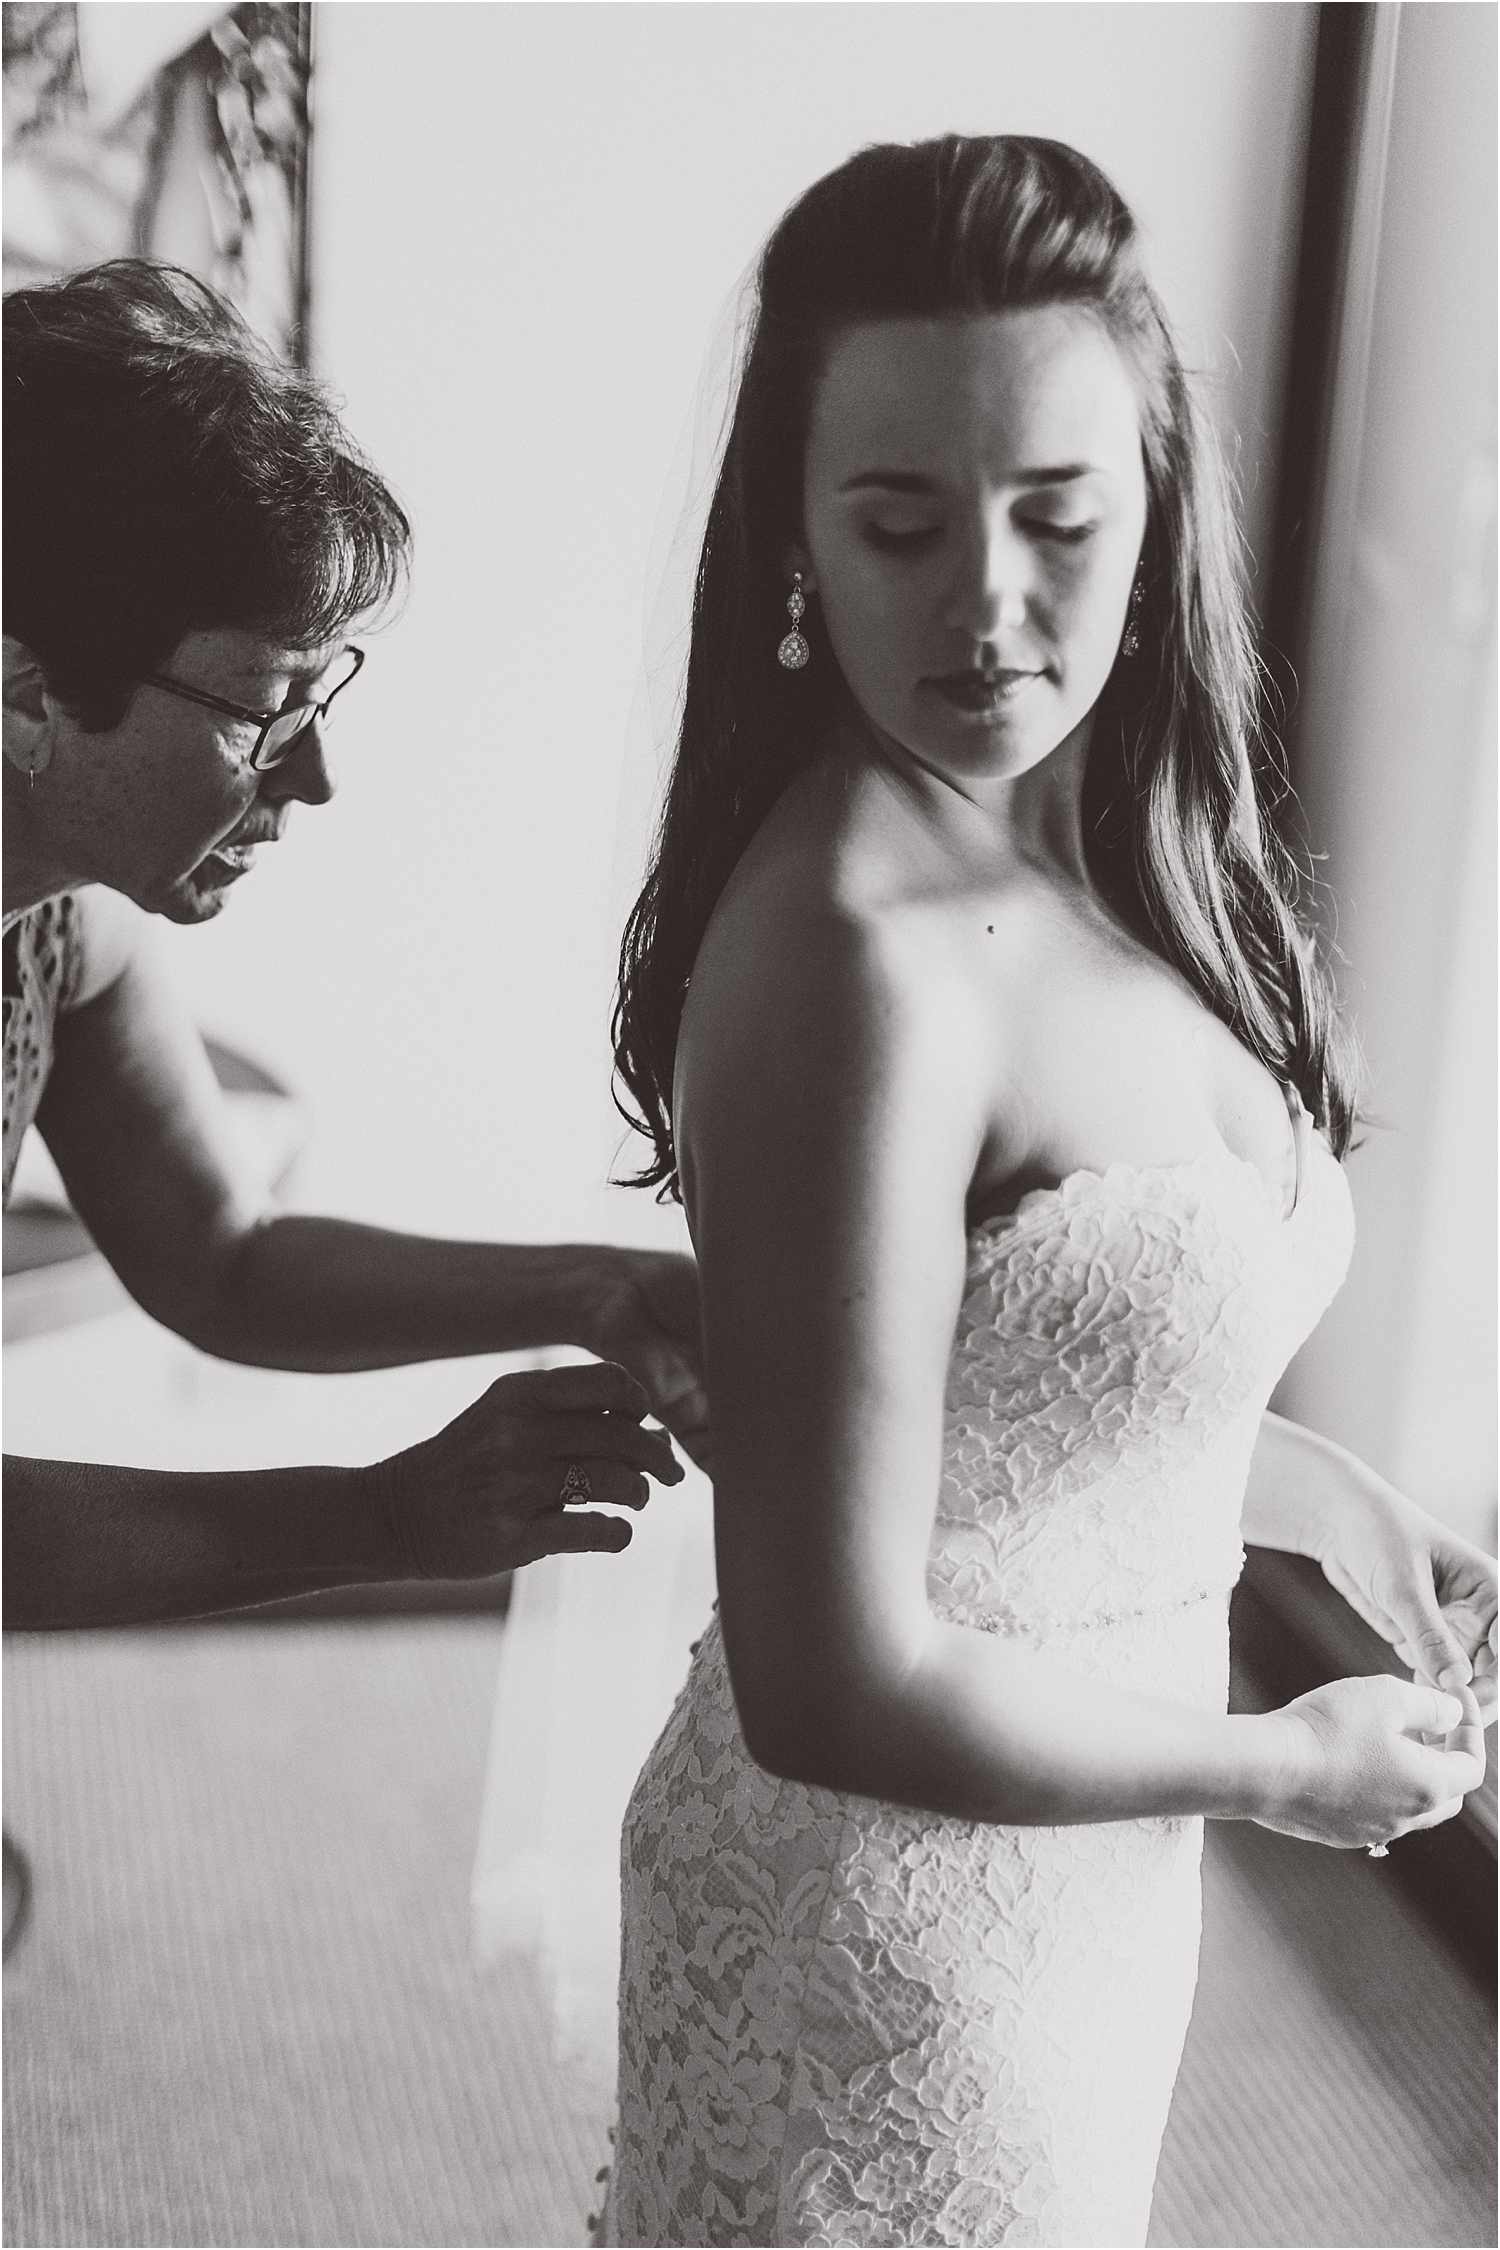 angie-diaz-photography-maui-wedding-ironwoods-beach_0012.jpg